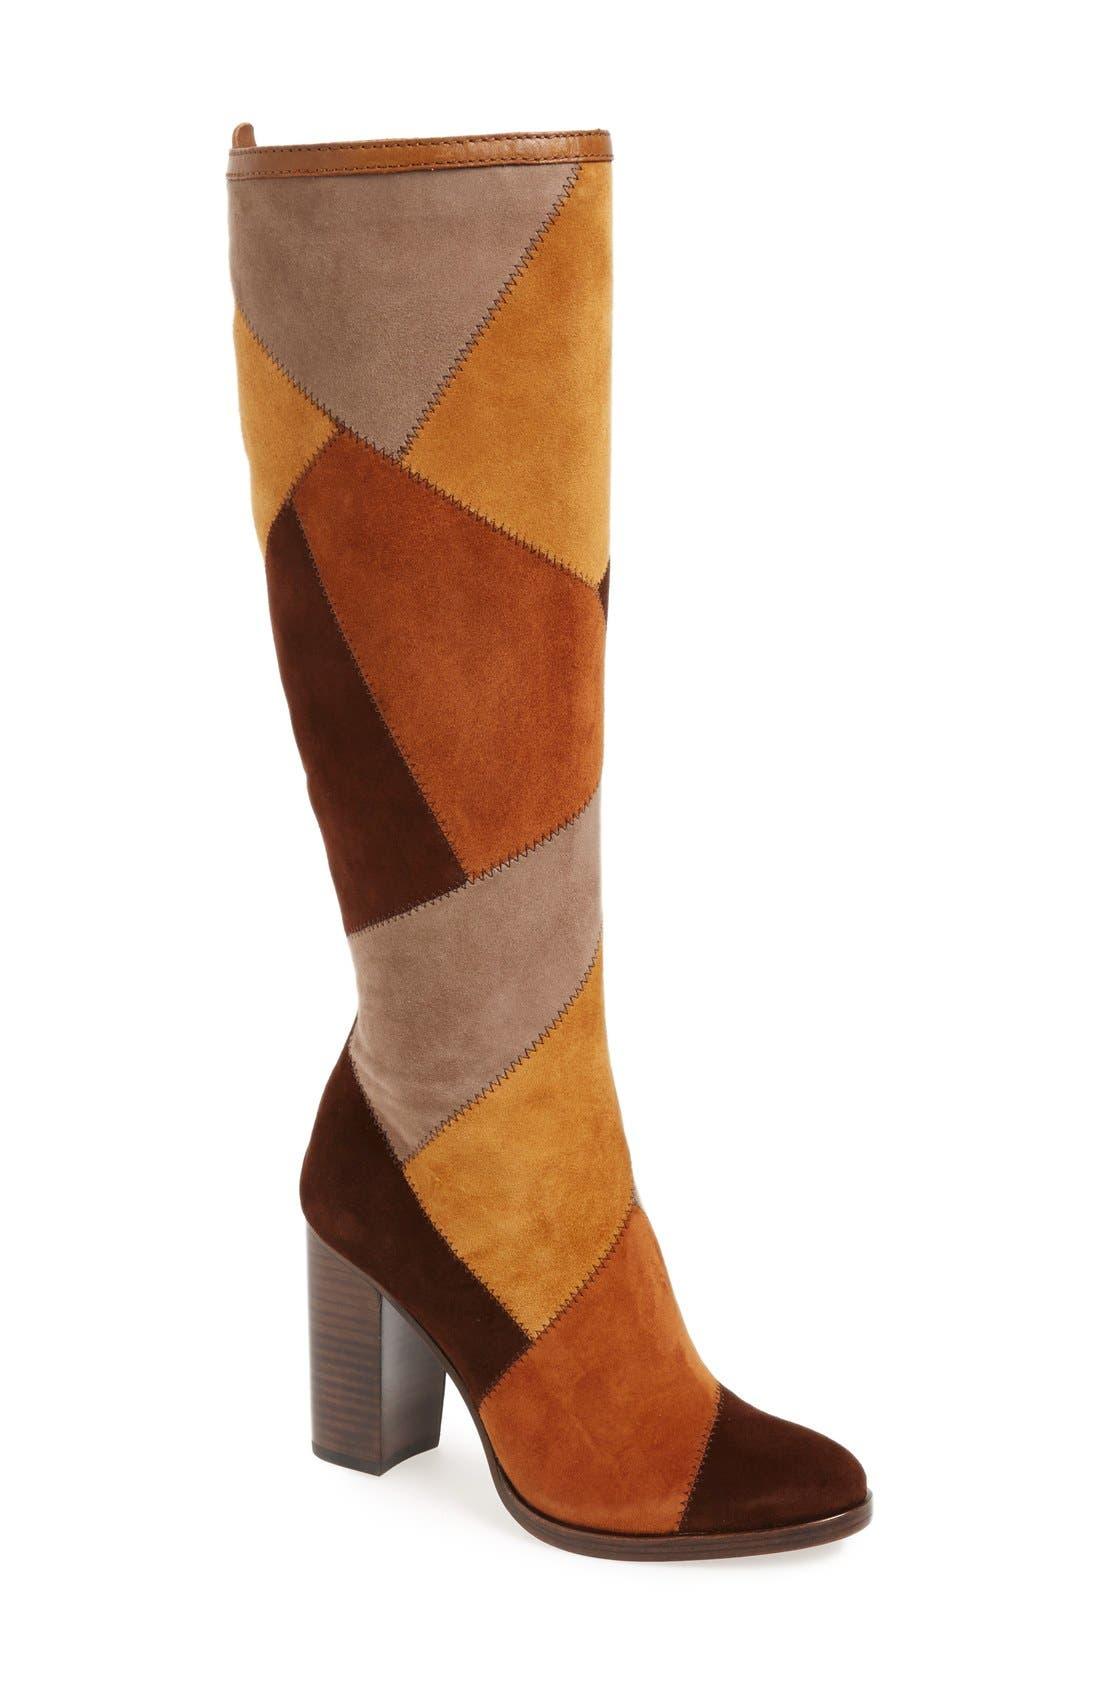 Alternate Image 1 Selected - Frye 'Claude' Knee High Patchwork Boot (Women)